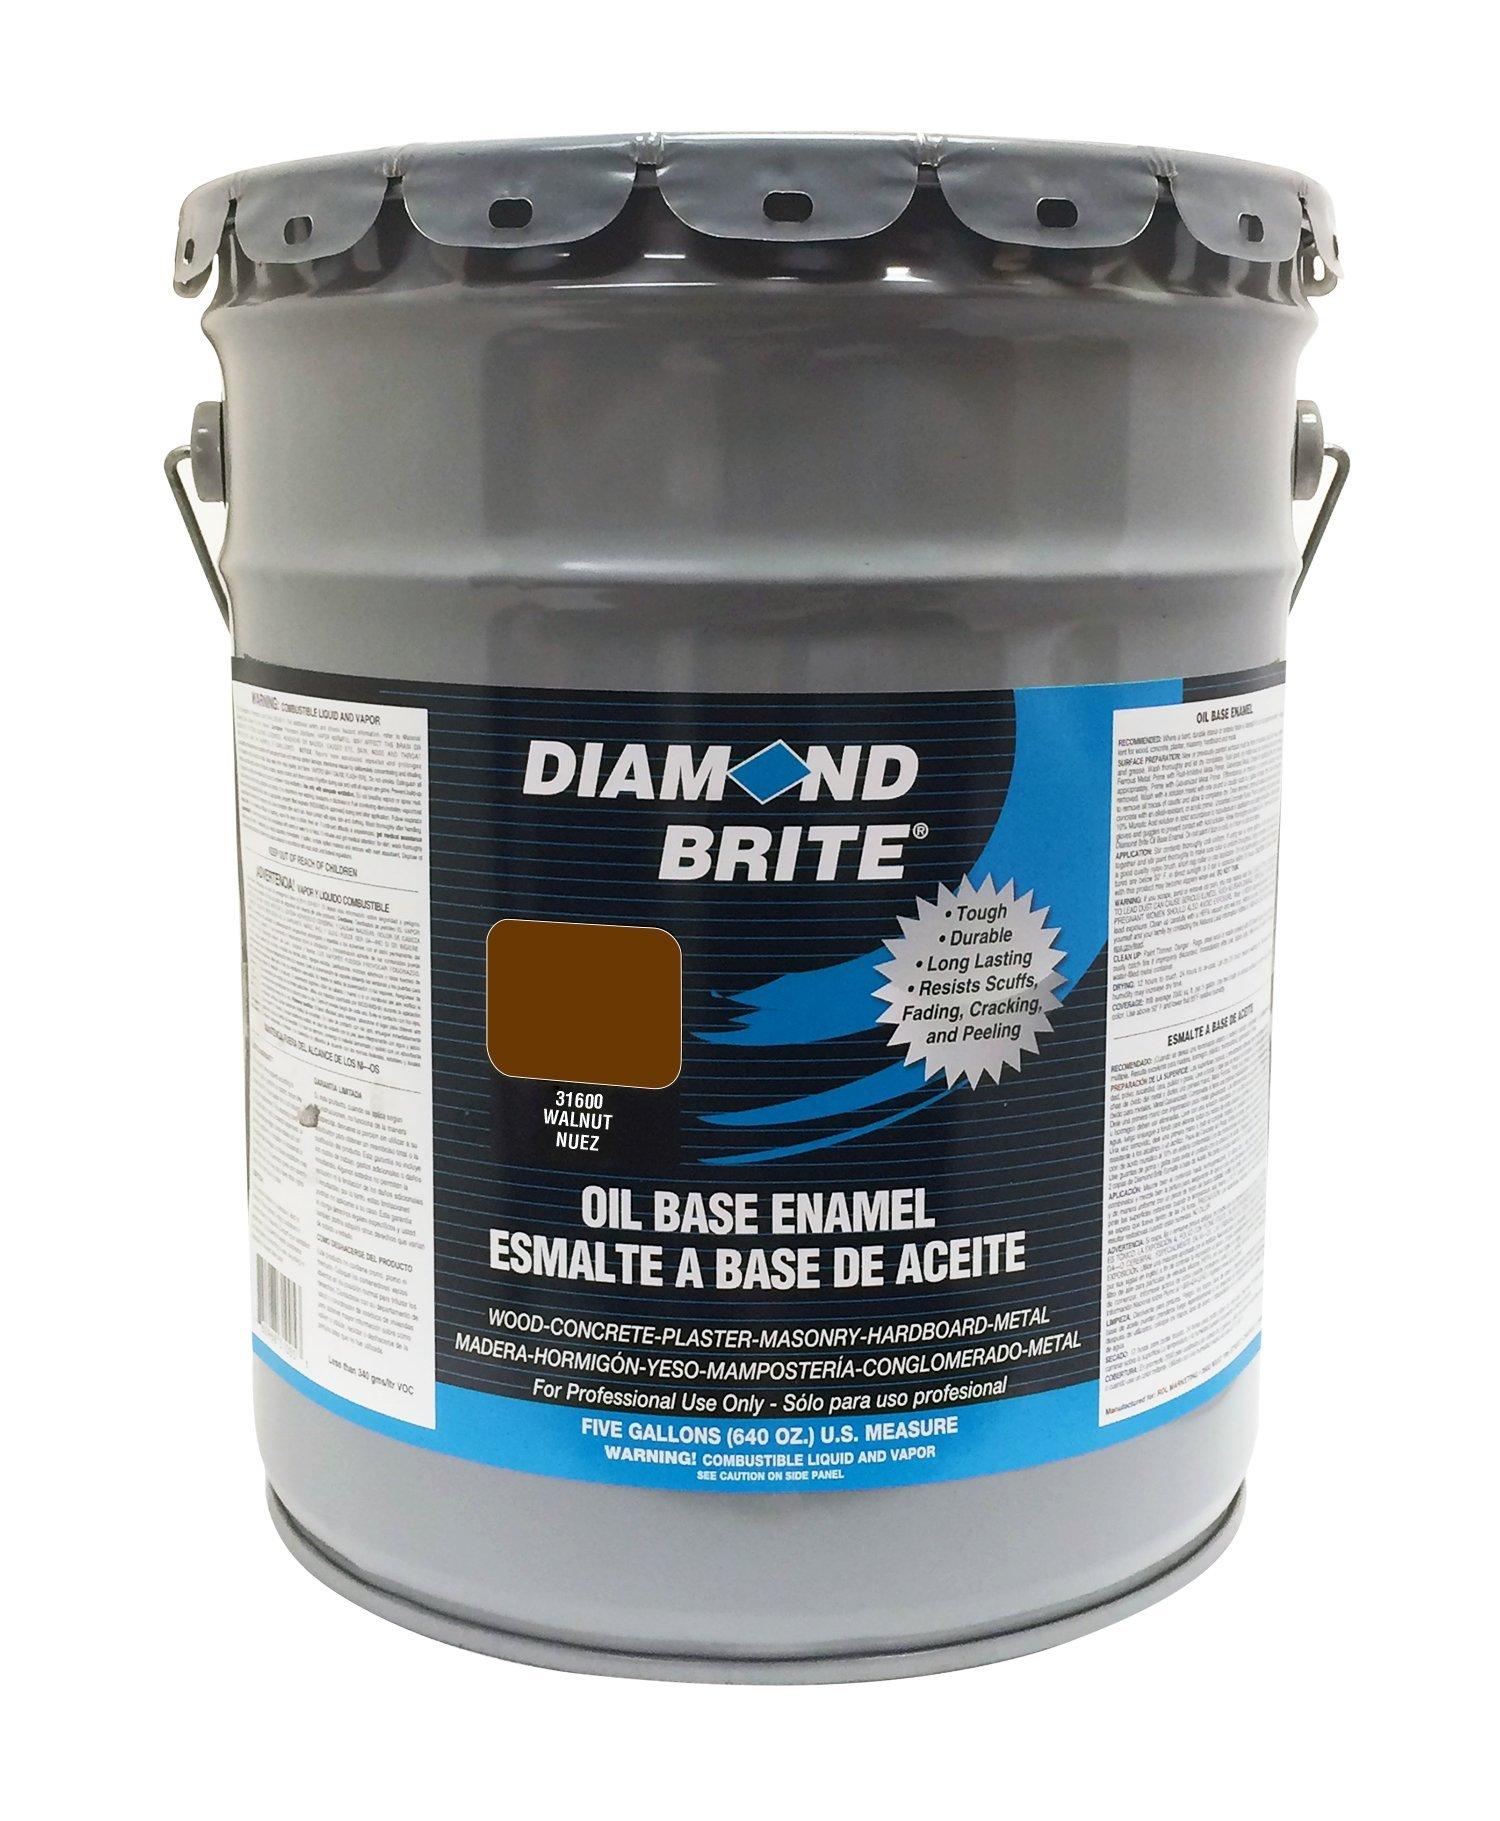 Diamond Brite Paint 31600 5-Gallon Oil Base All Purpose Enamel Paint   Walnut